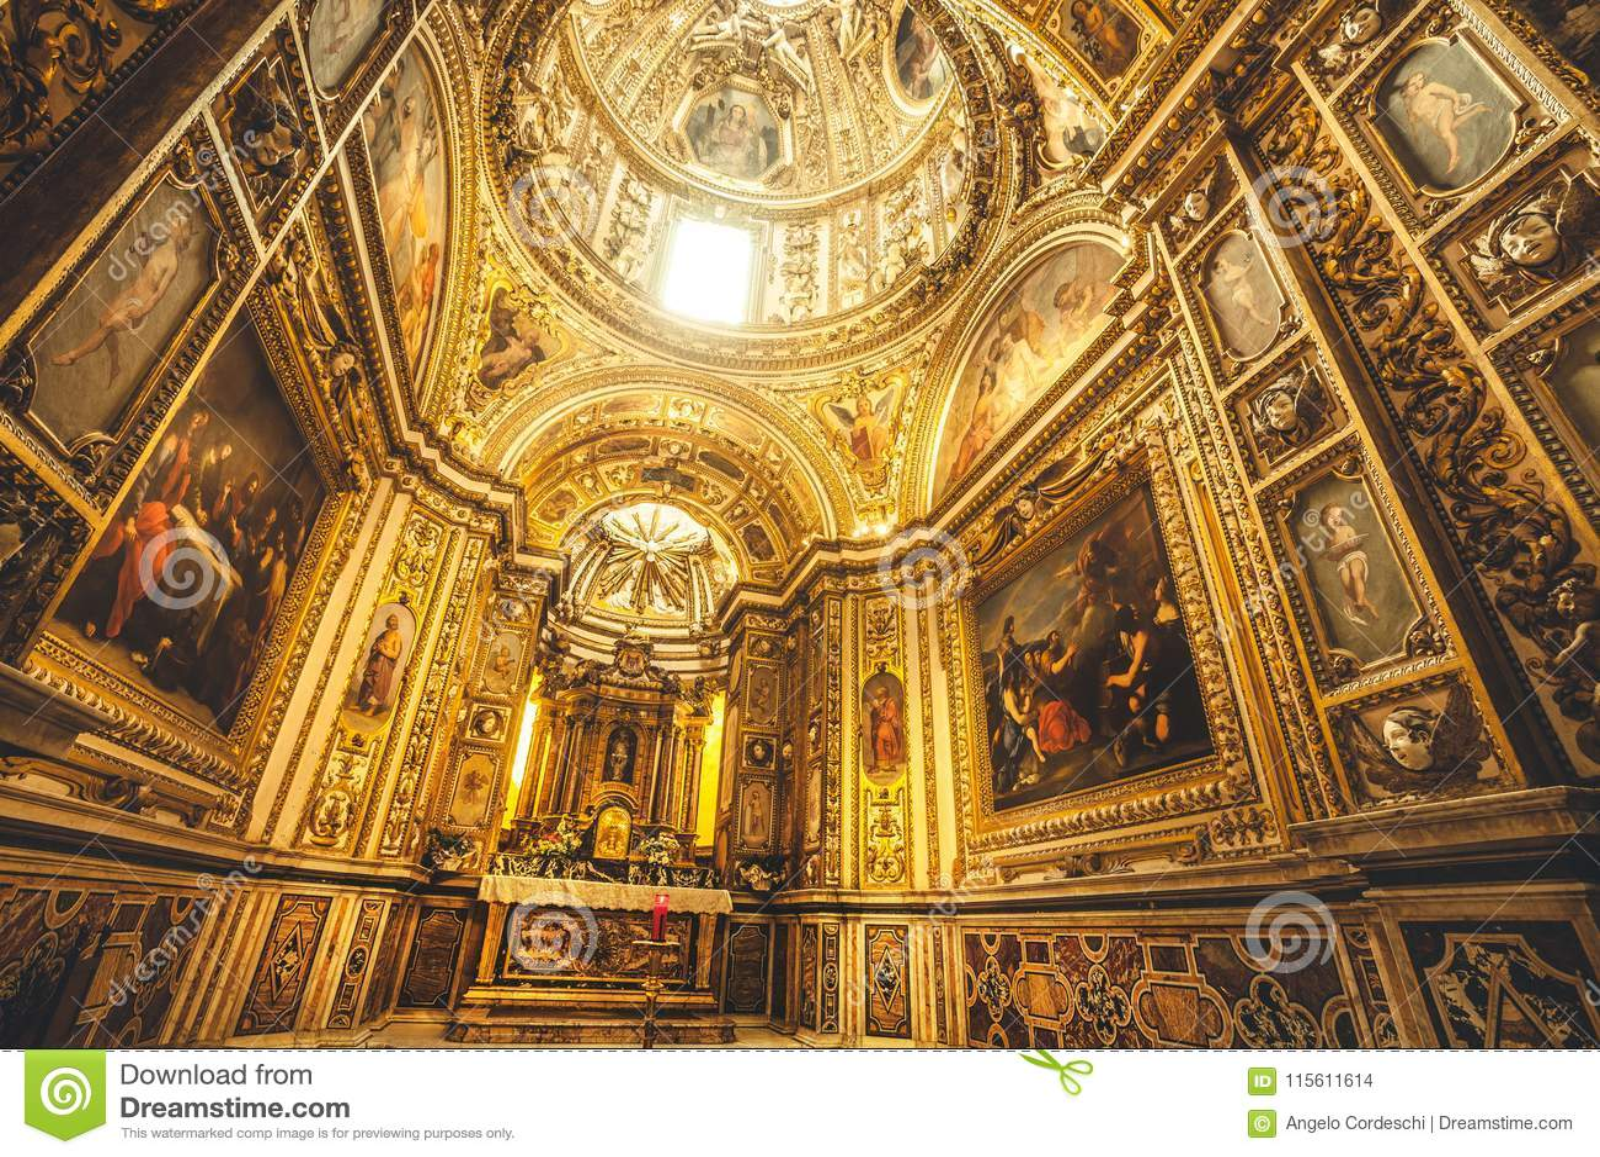 Capilla del sacramento dentro de la catedral de Santa Maria Assunta en el centro histórico de Rieti en Italia